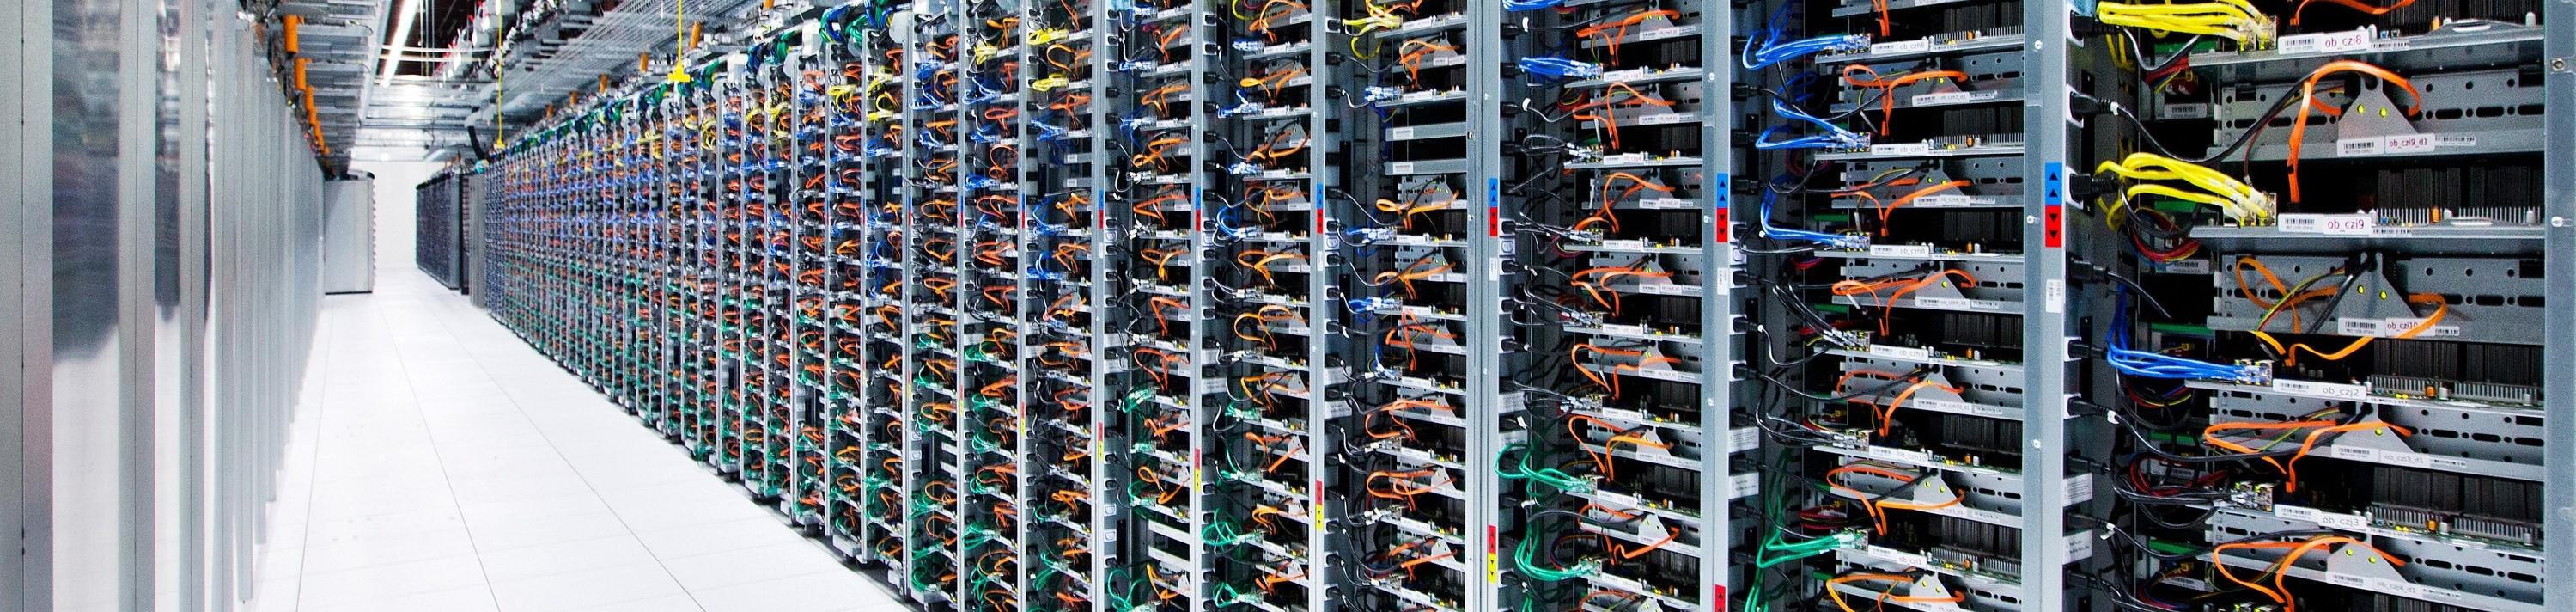 # NEREIDA - kasy fiskalne, komputery, serwis